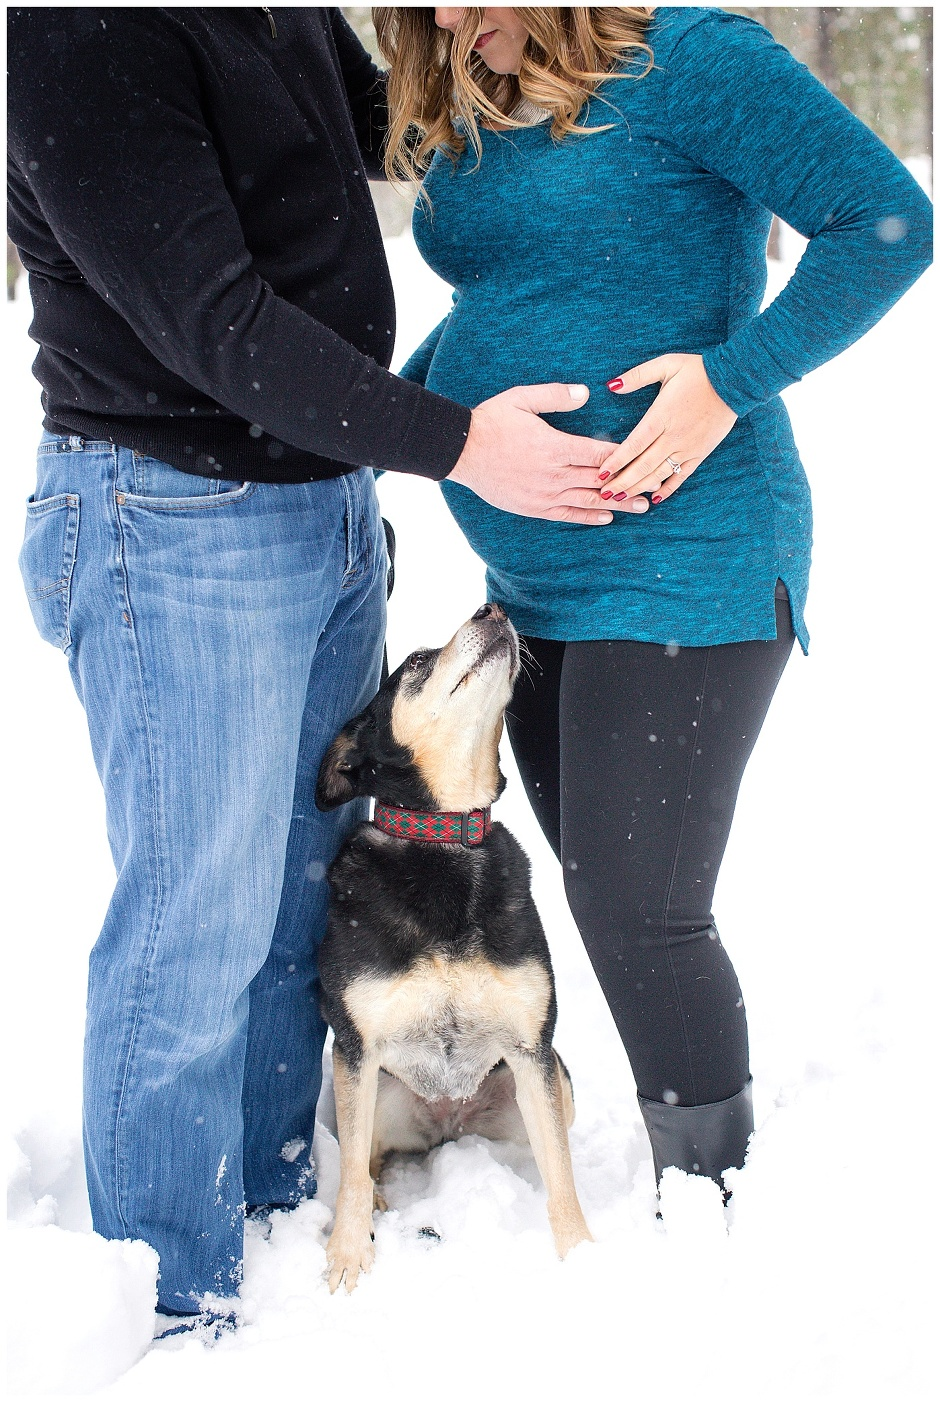 Sunriver Oregon Snowy Maternity Photography // Mellissa & Rick // Twin Maternity Photos // Stevi Sayler Photography